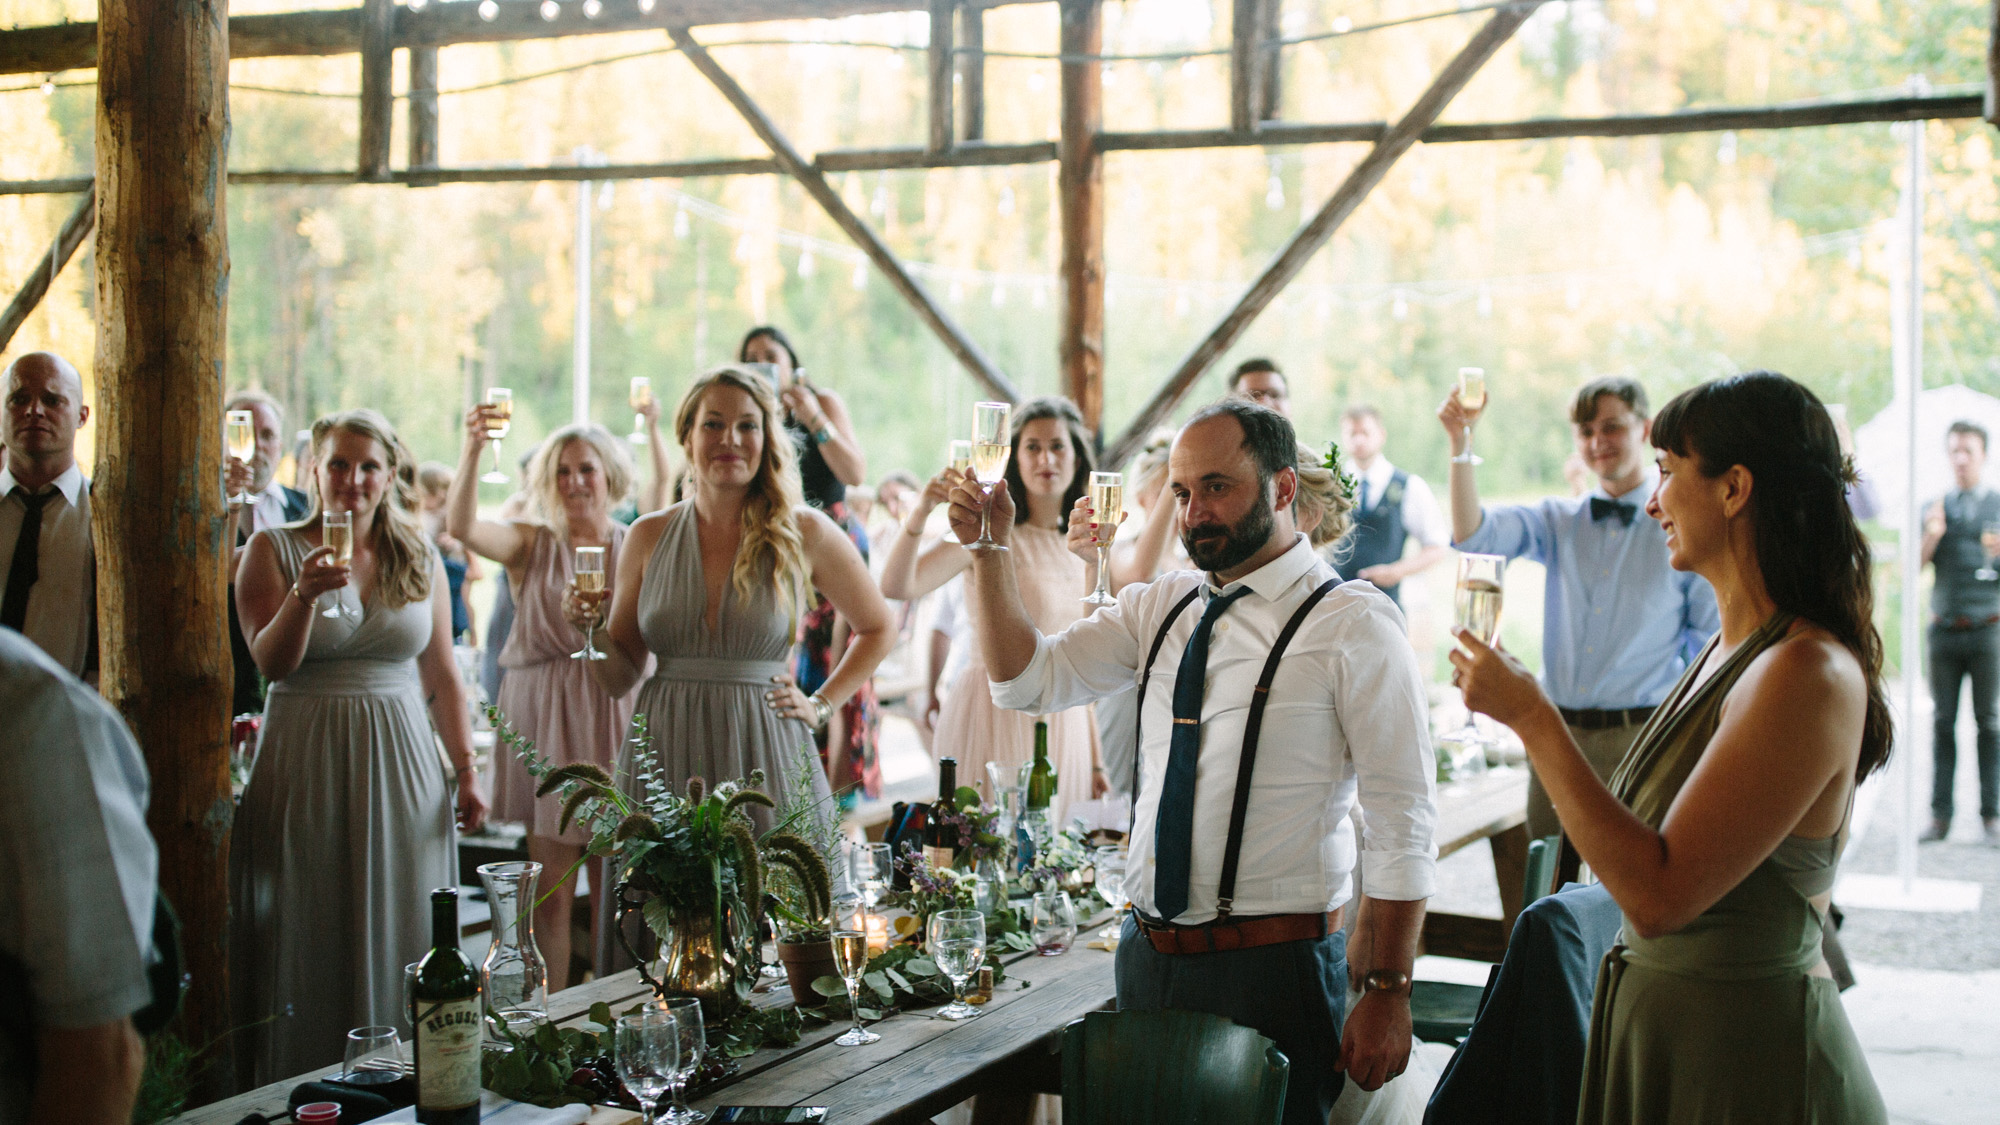 Montana_Wedding_Photos_alec_vanderboom-0136.jpg